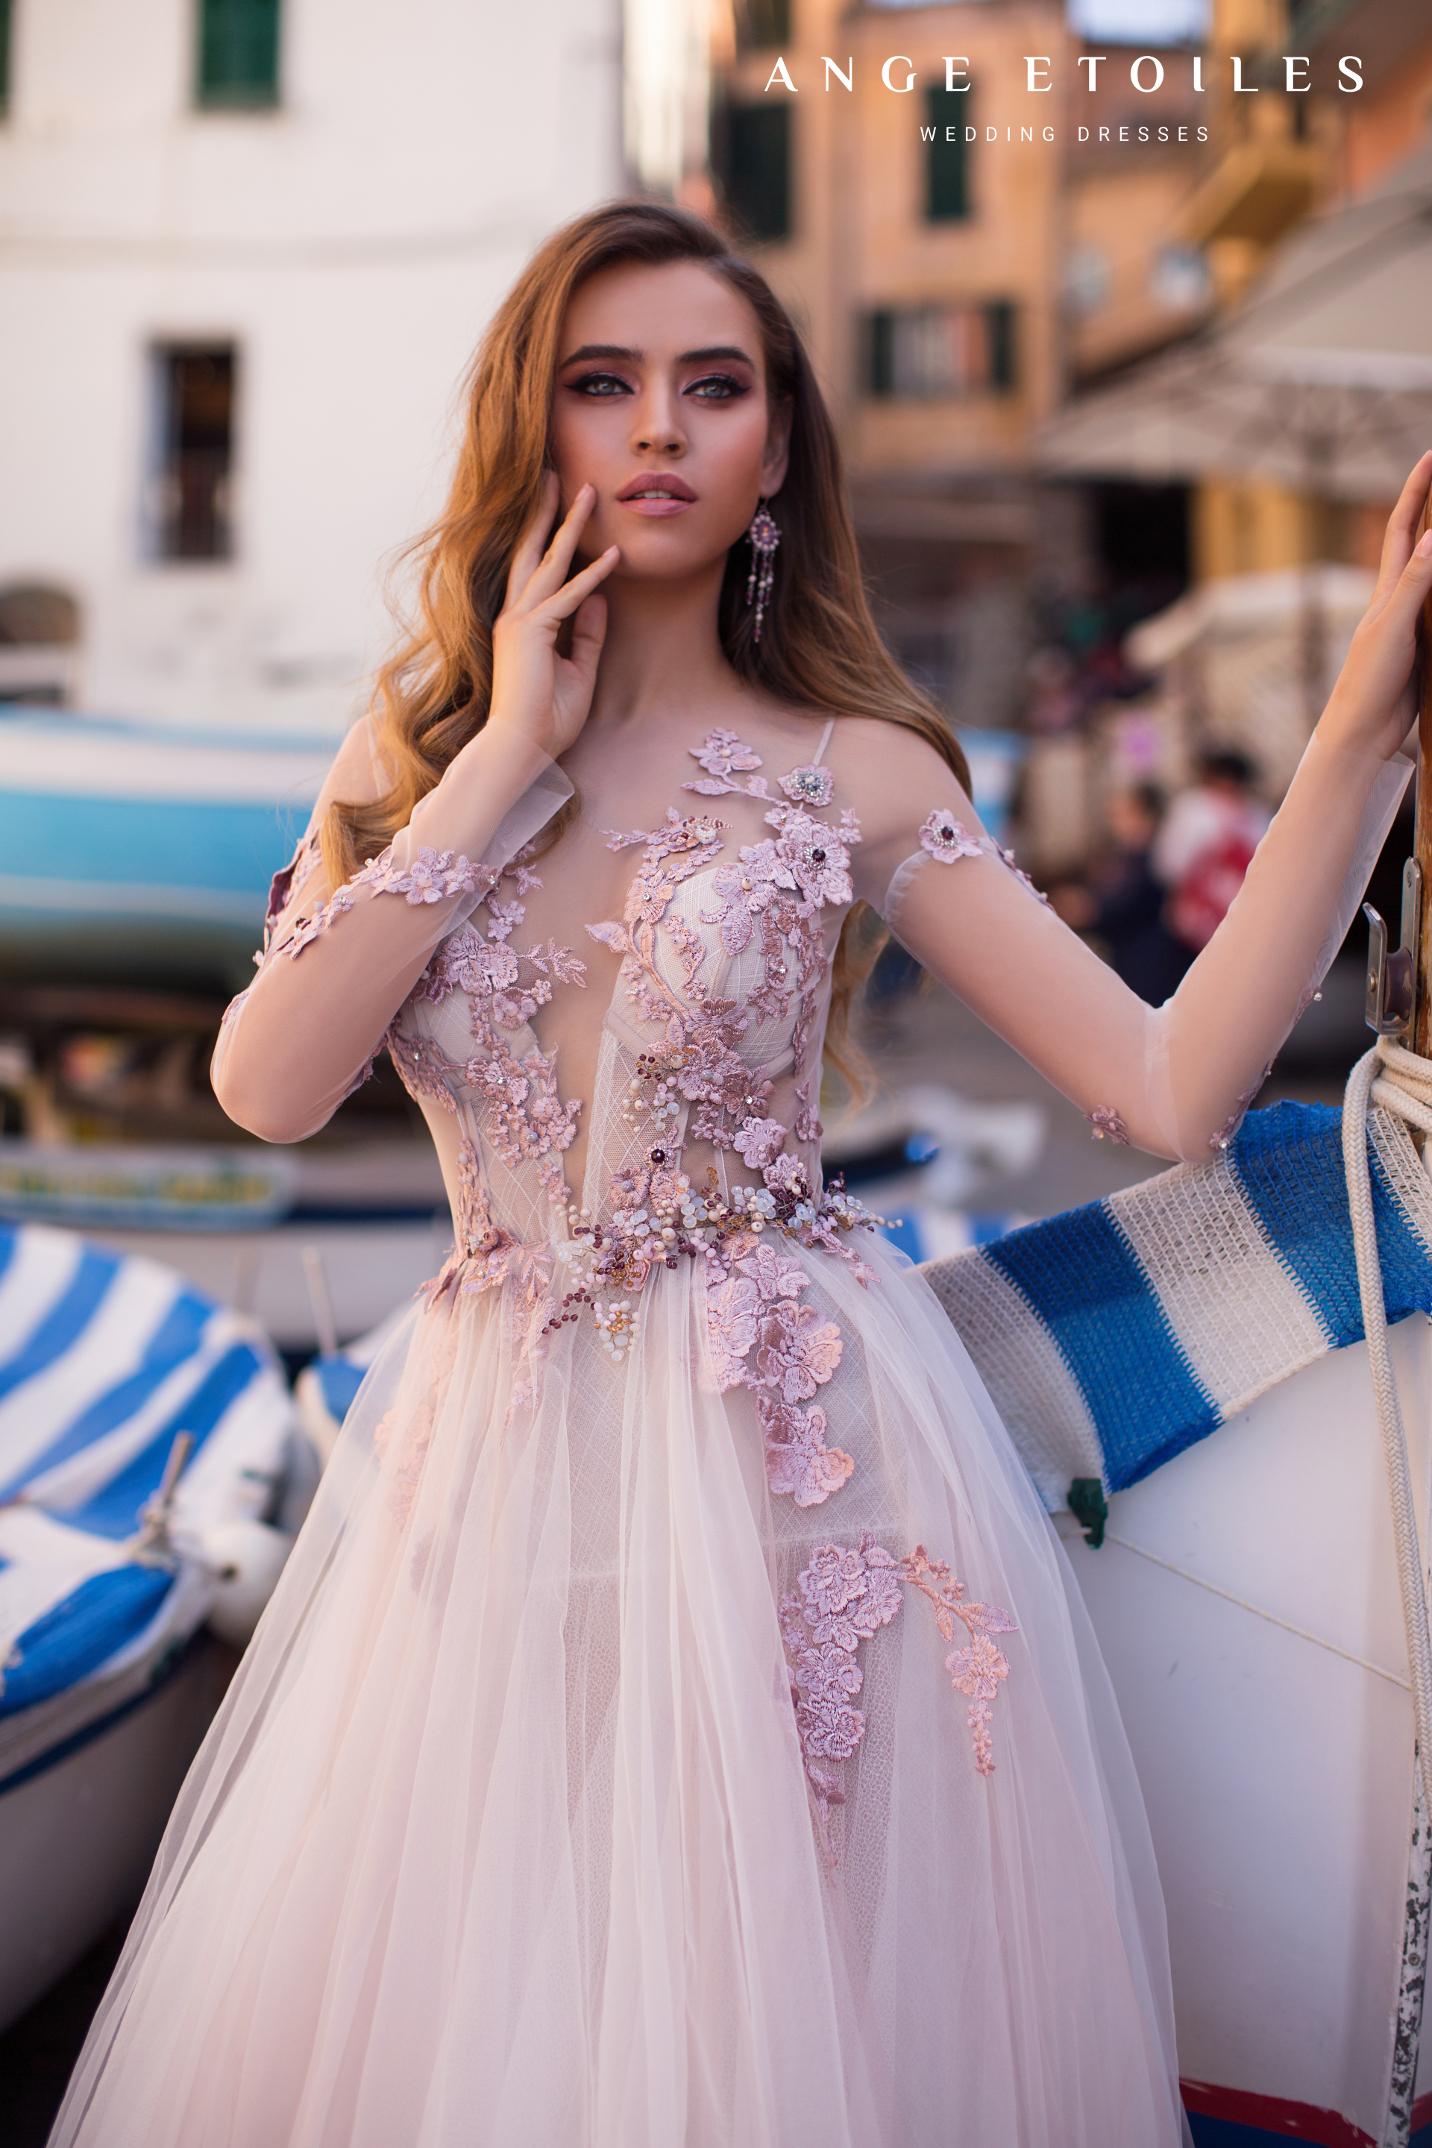 vestuvine-suknele-ange-etoiles-floren